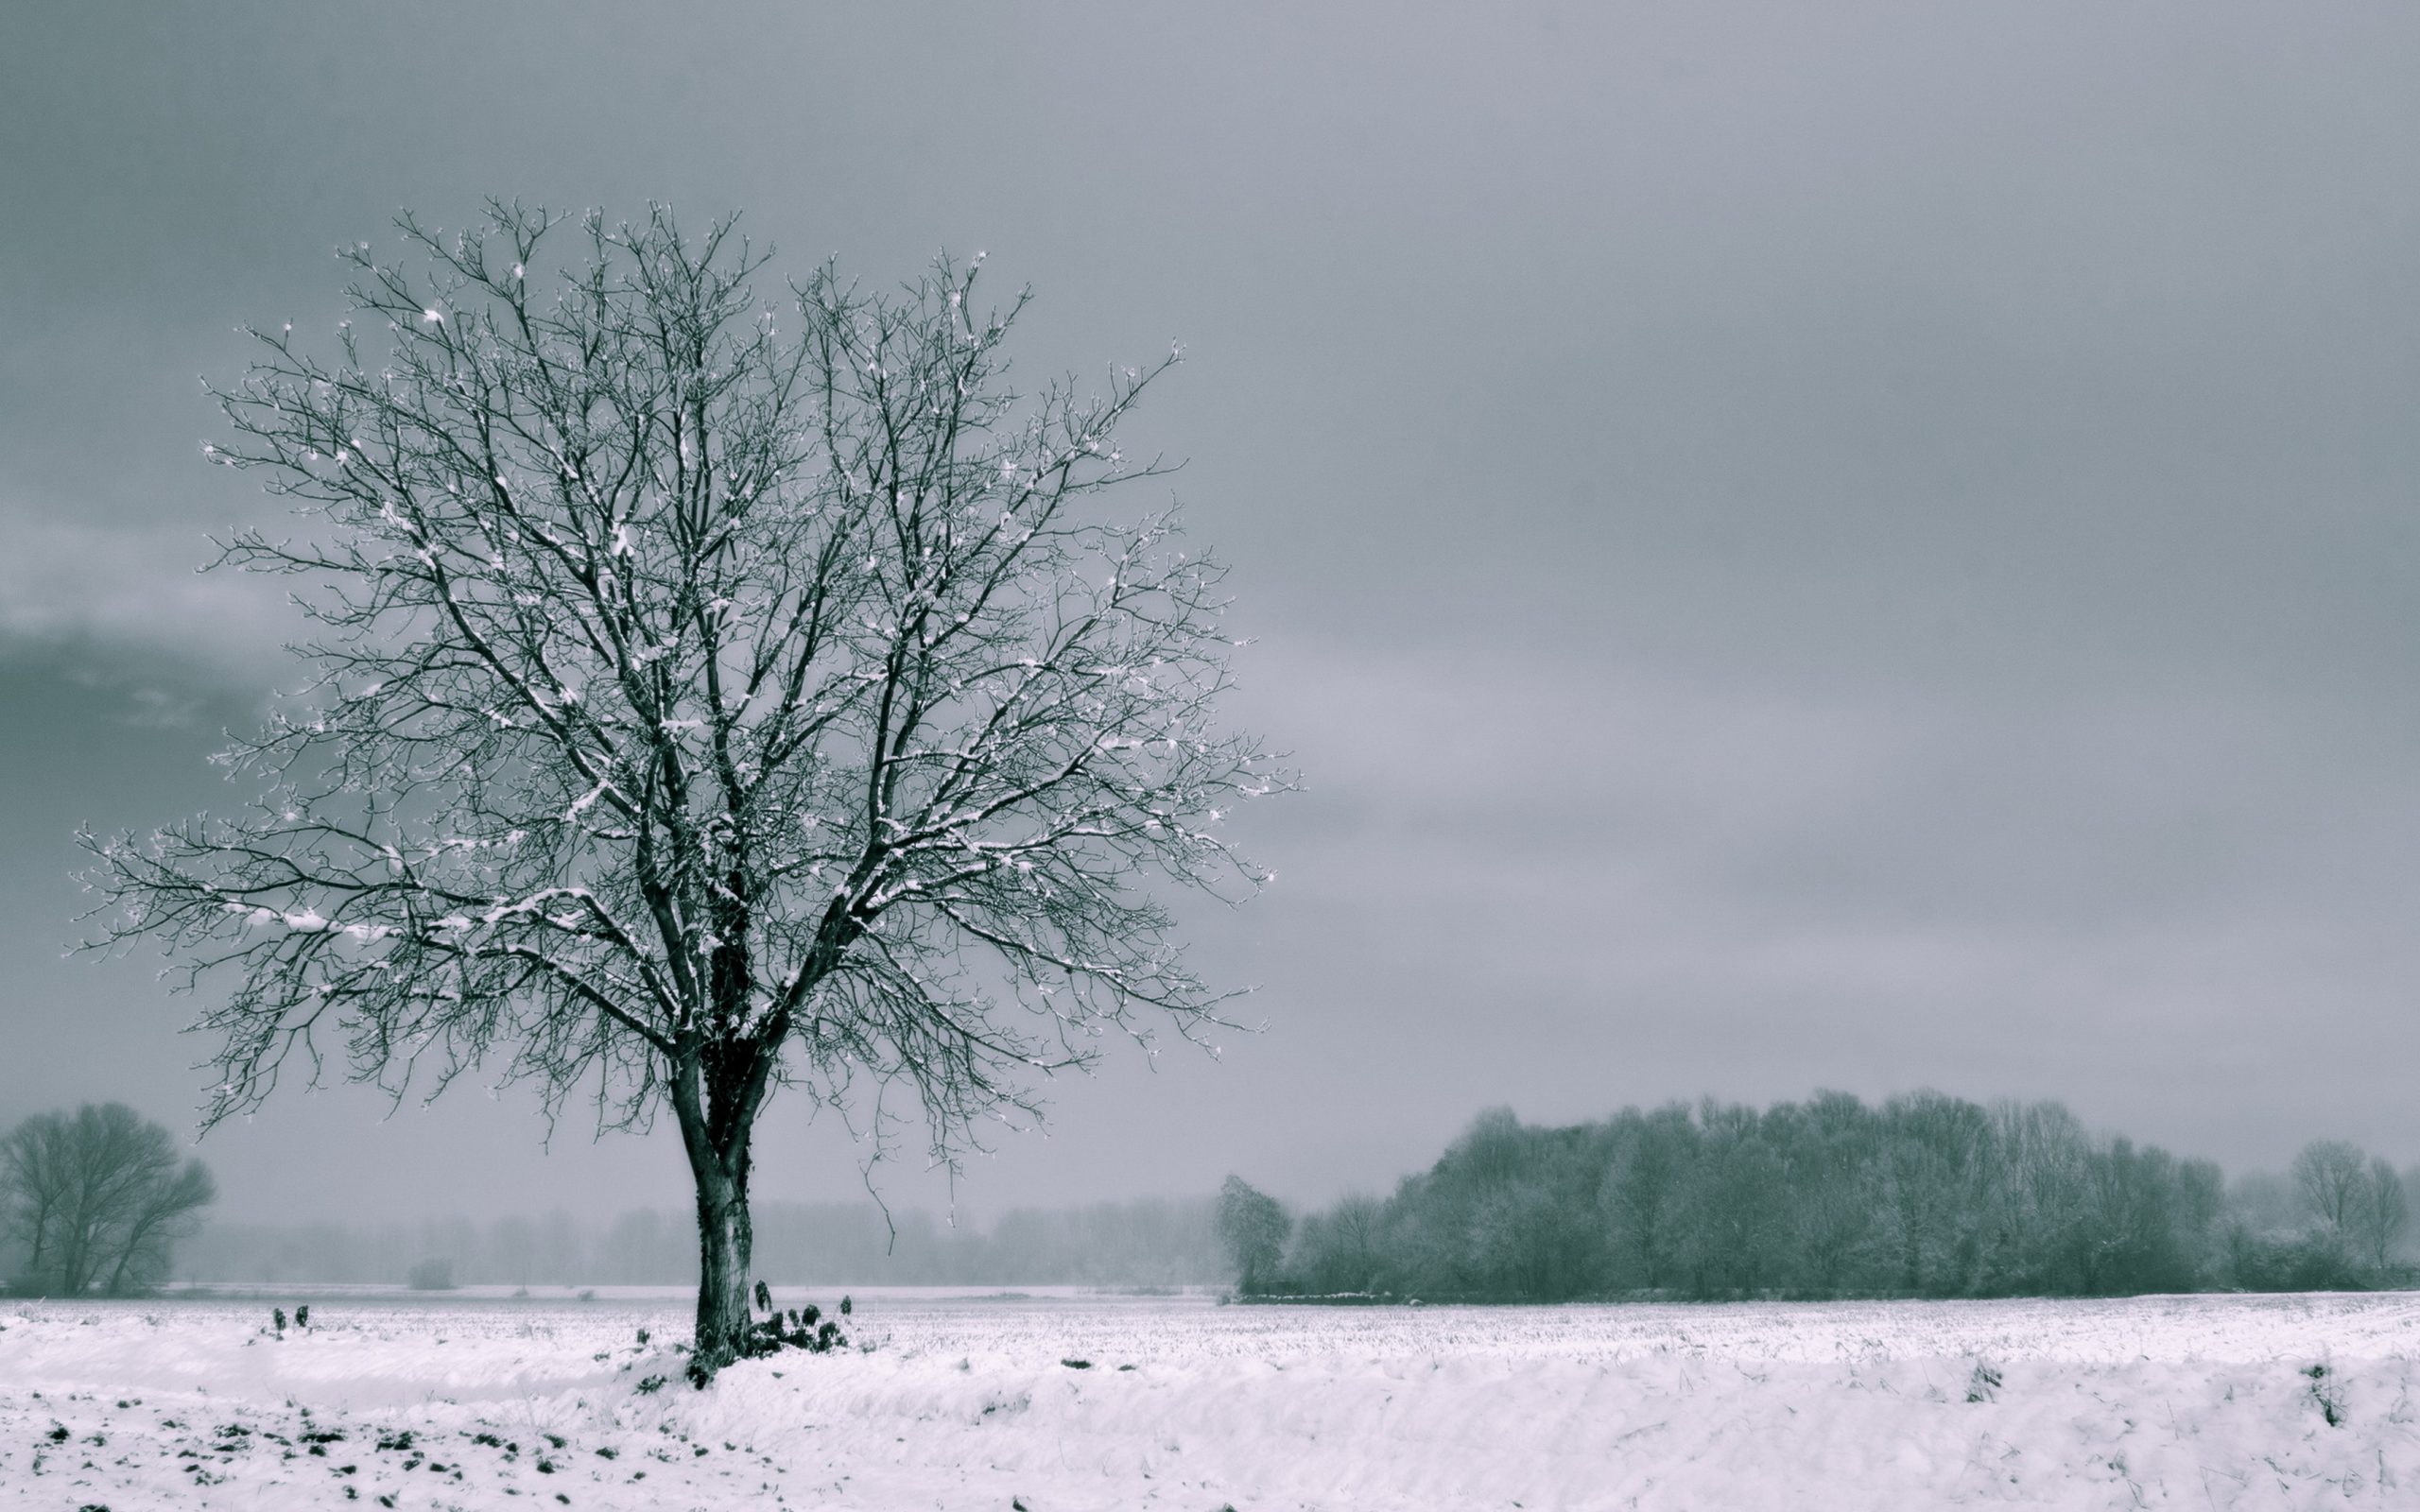 Winter wallpaper 720x1280